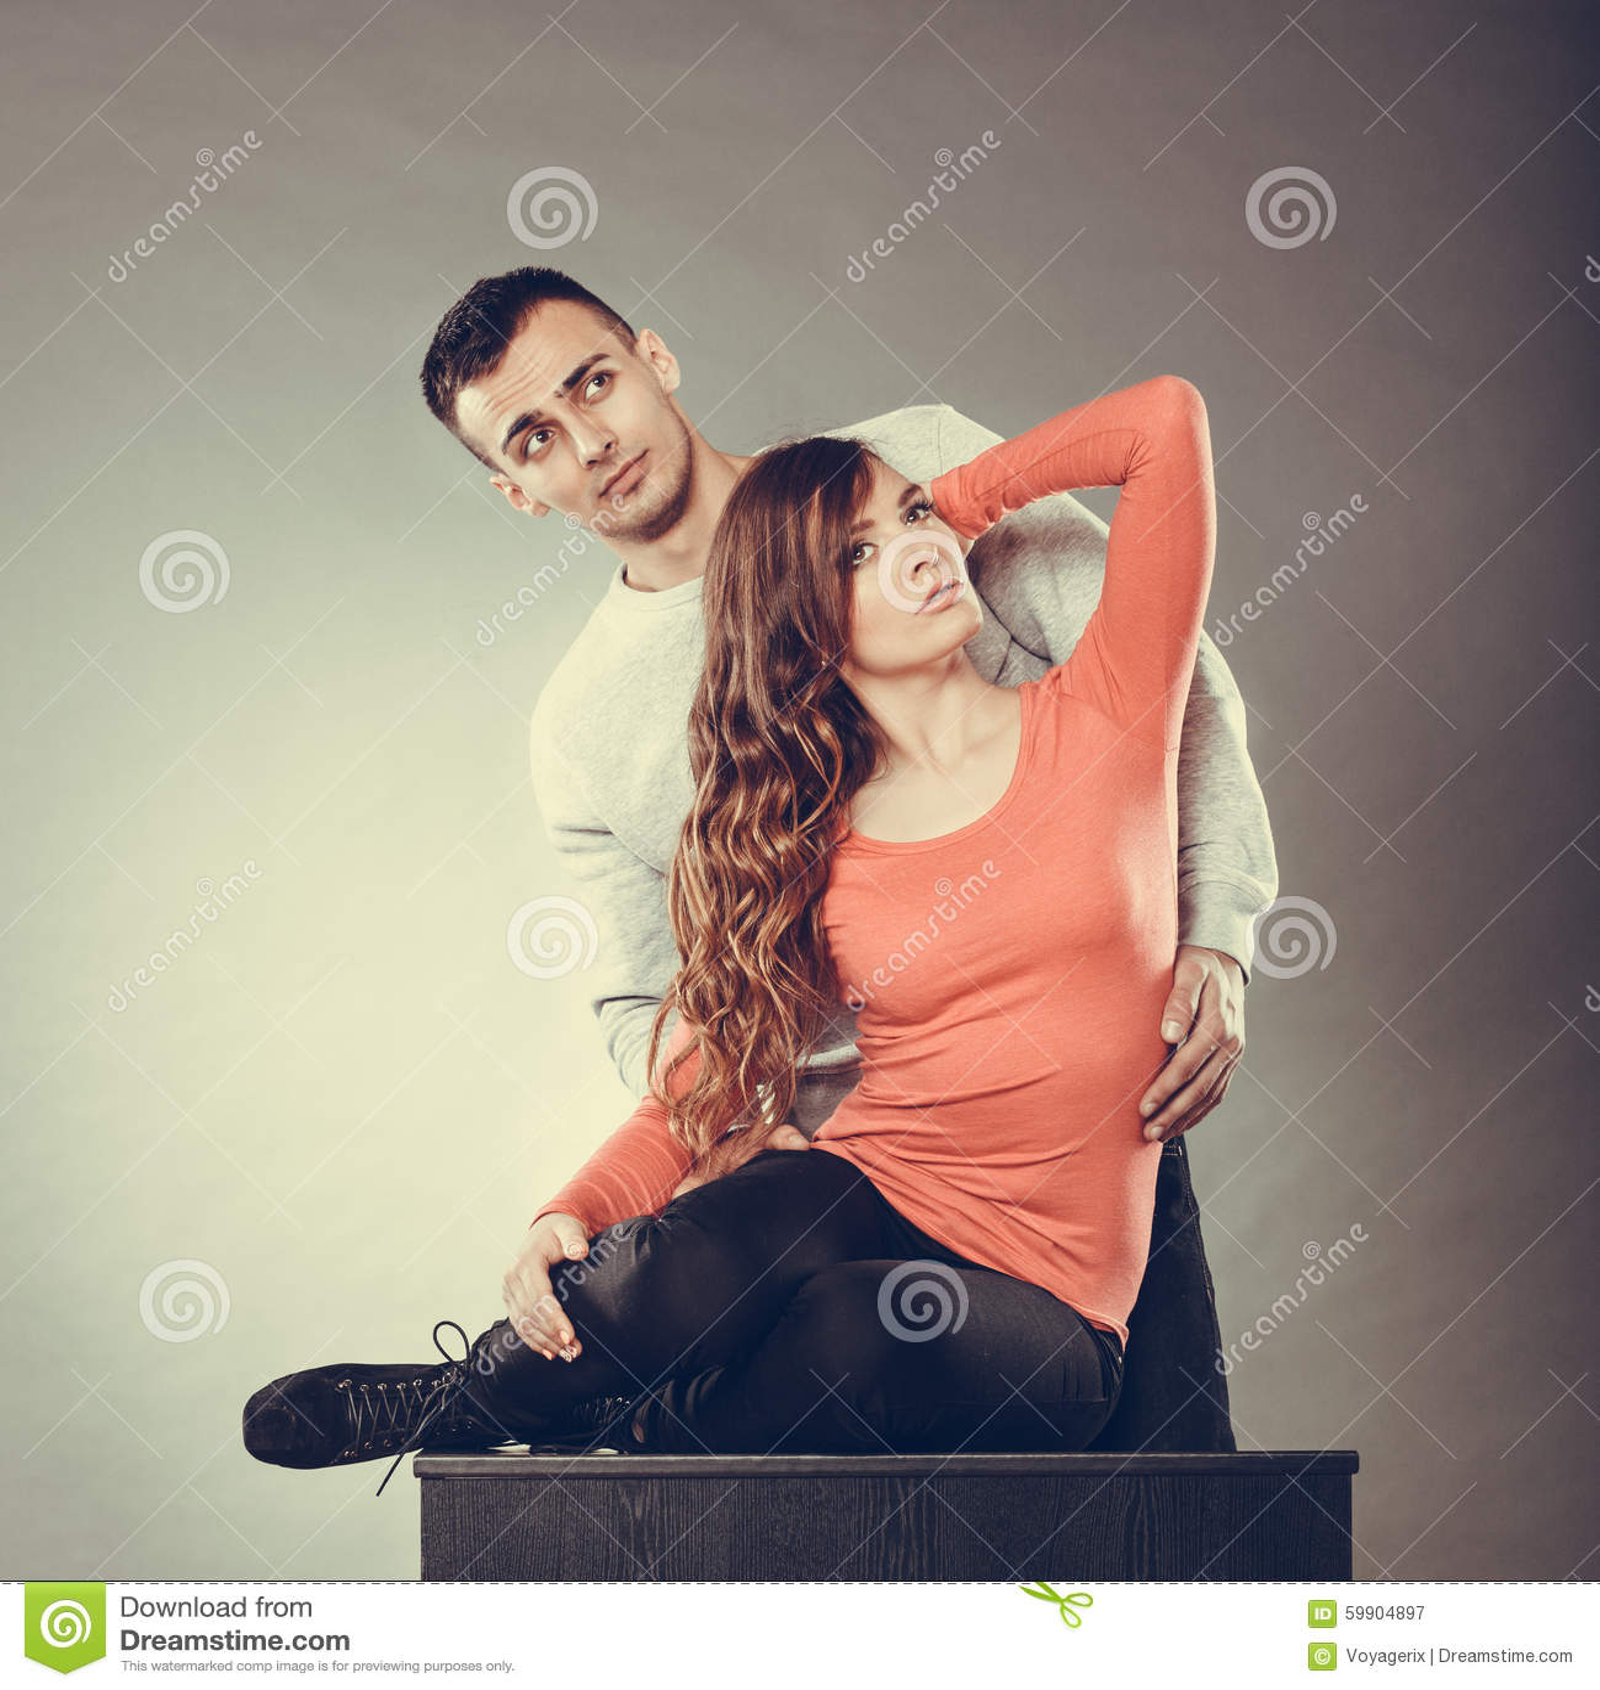 Jouer flirter filles attrayant homme bleue